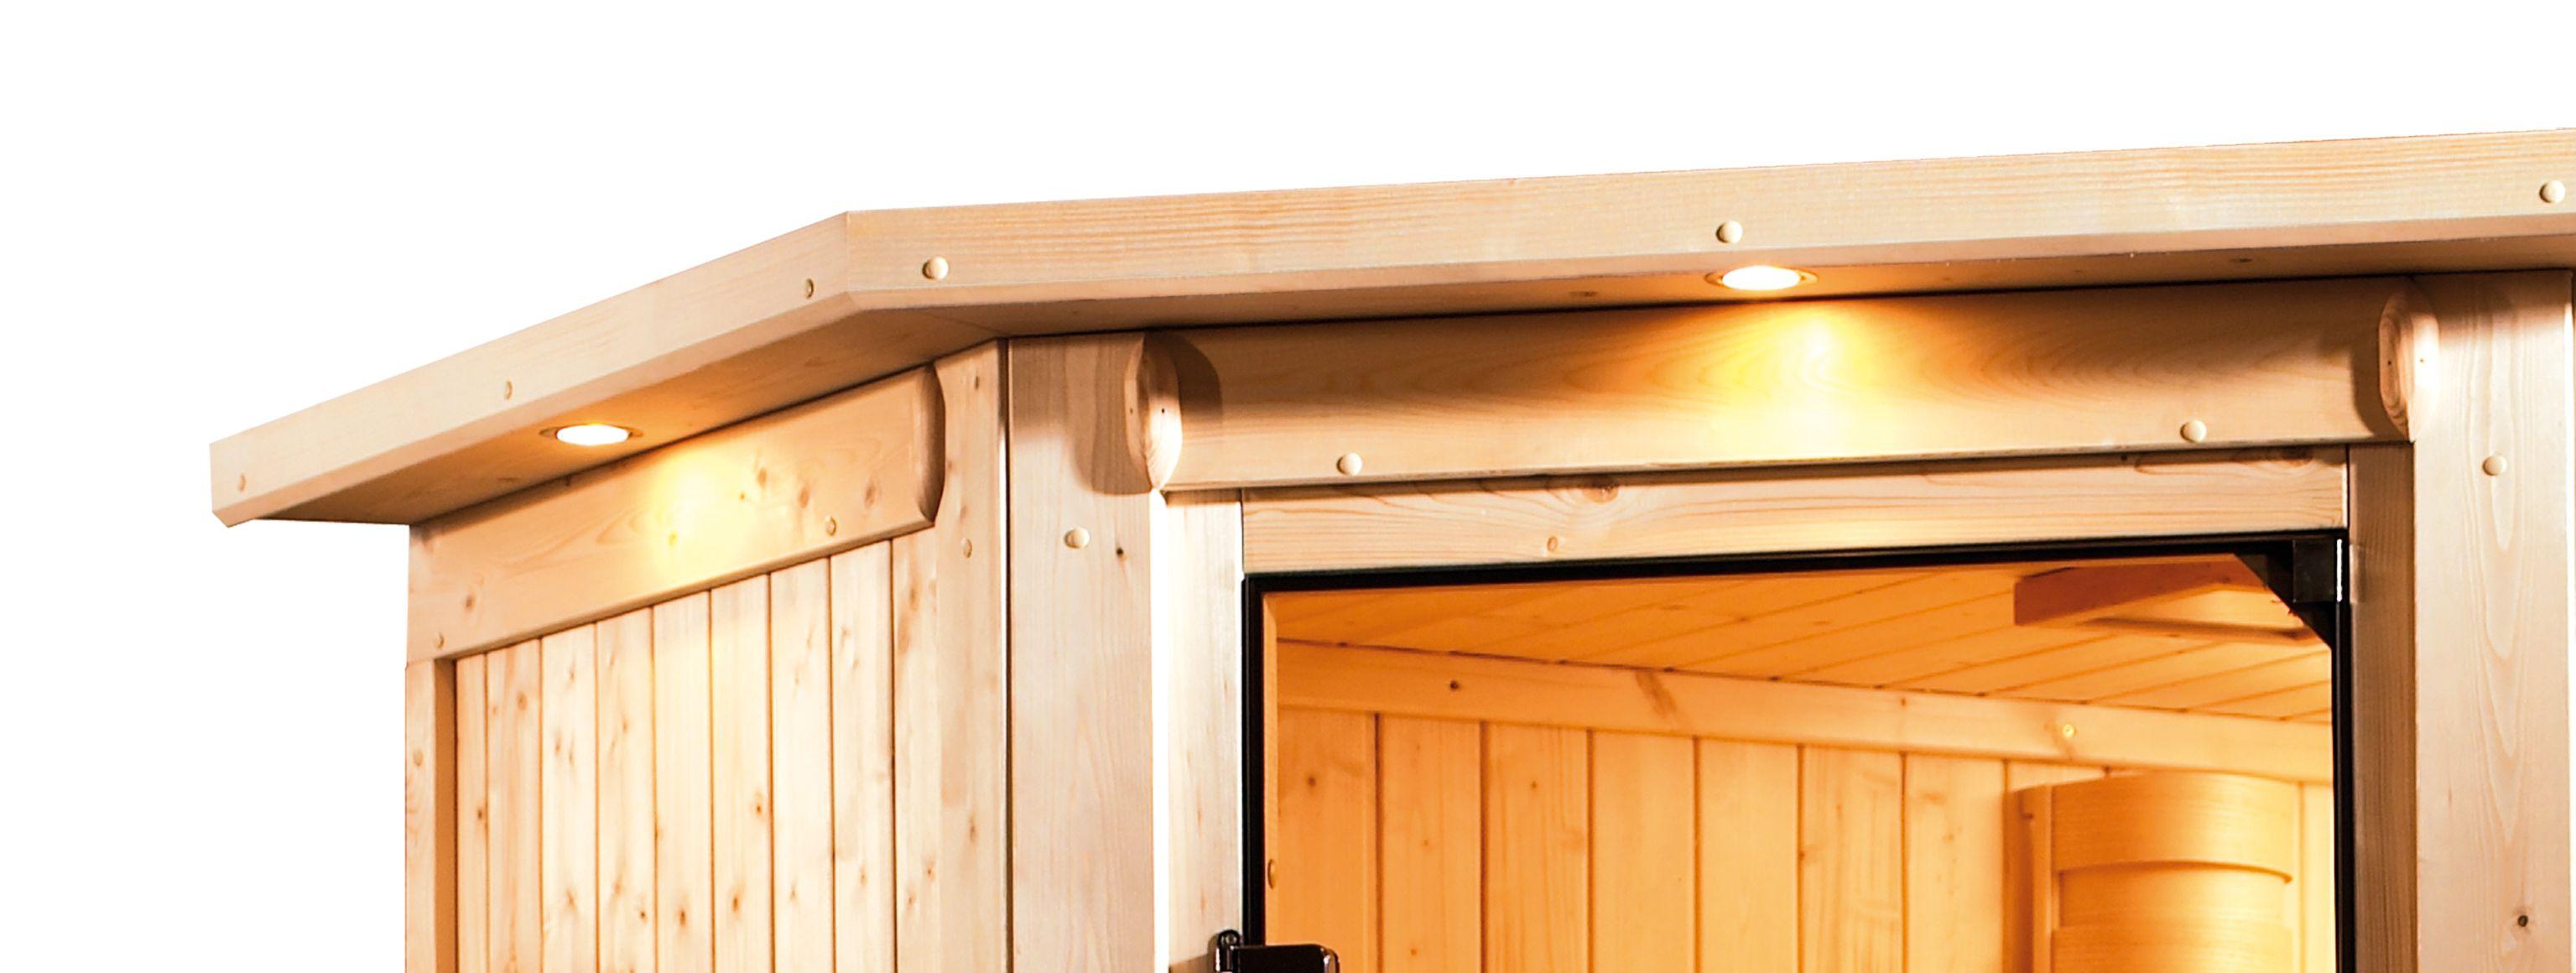 Karibu Sauna Ilona 40mm Dachkranz Bio Ofen 9kW extern Bild 11